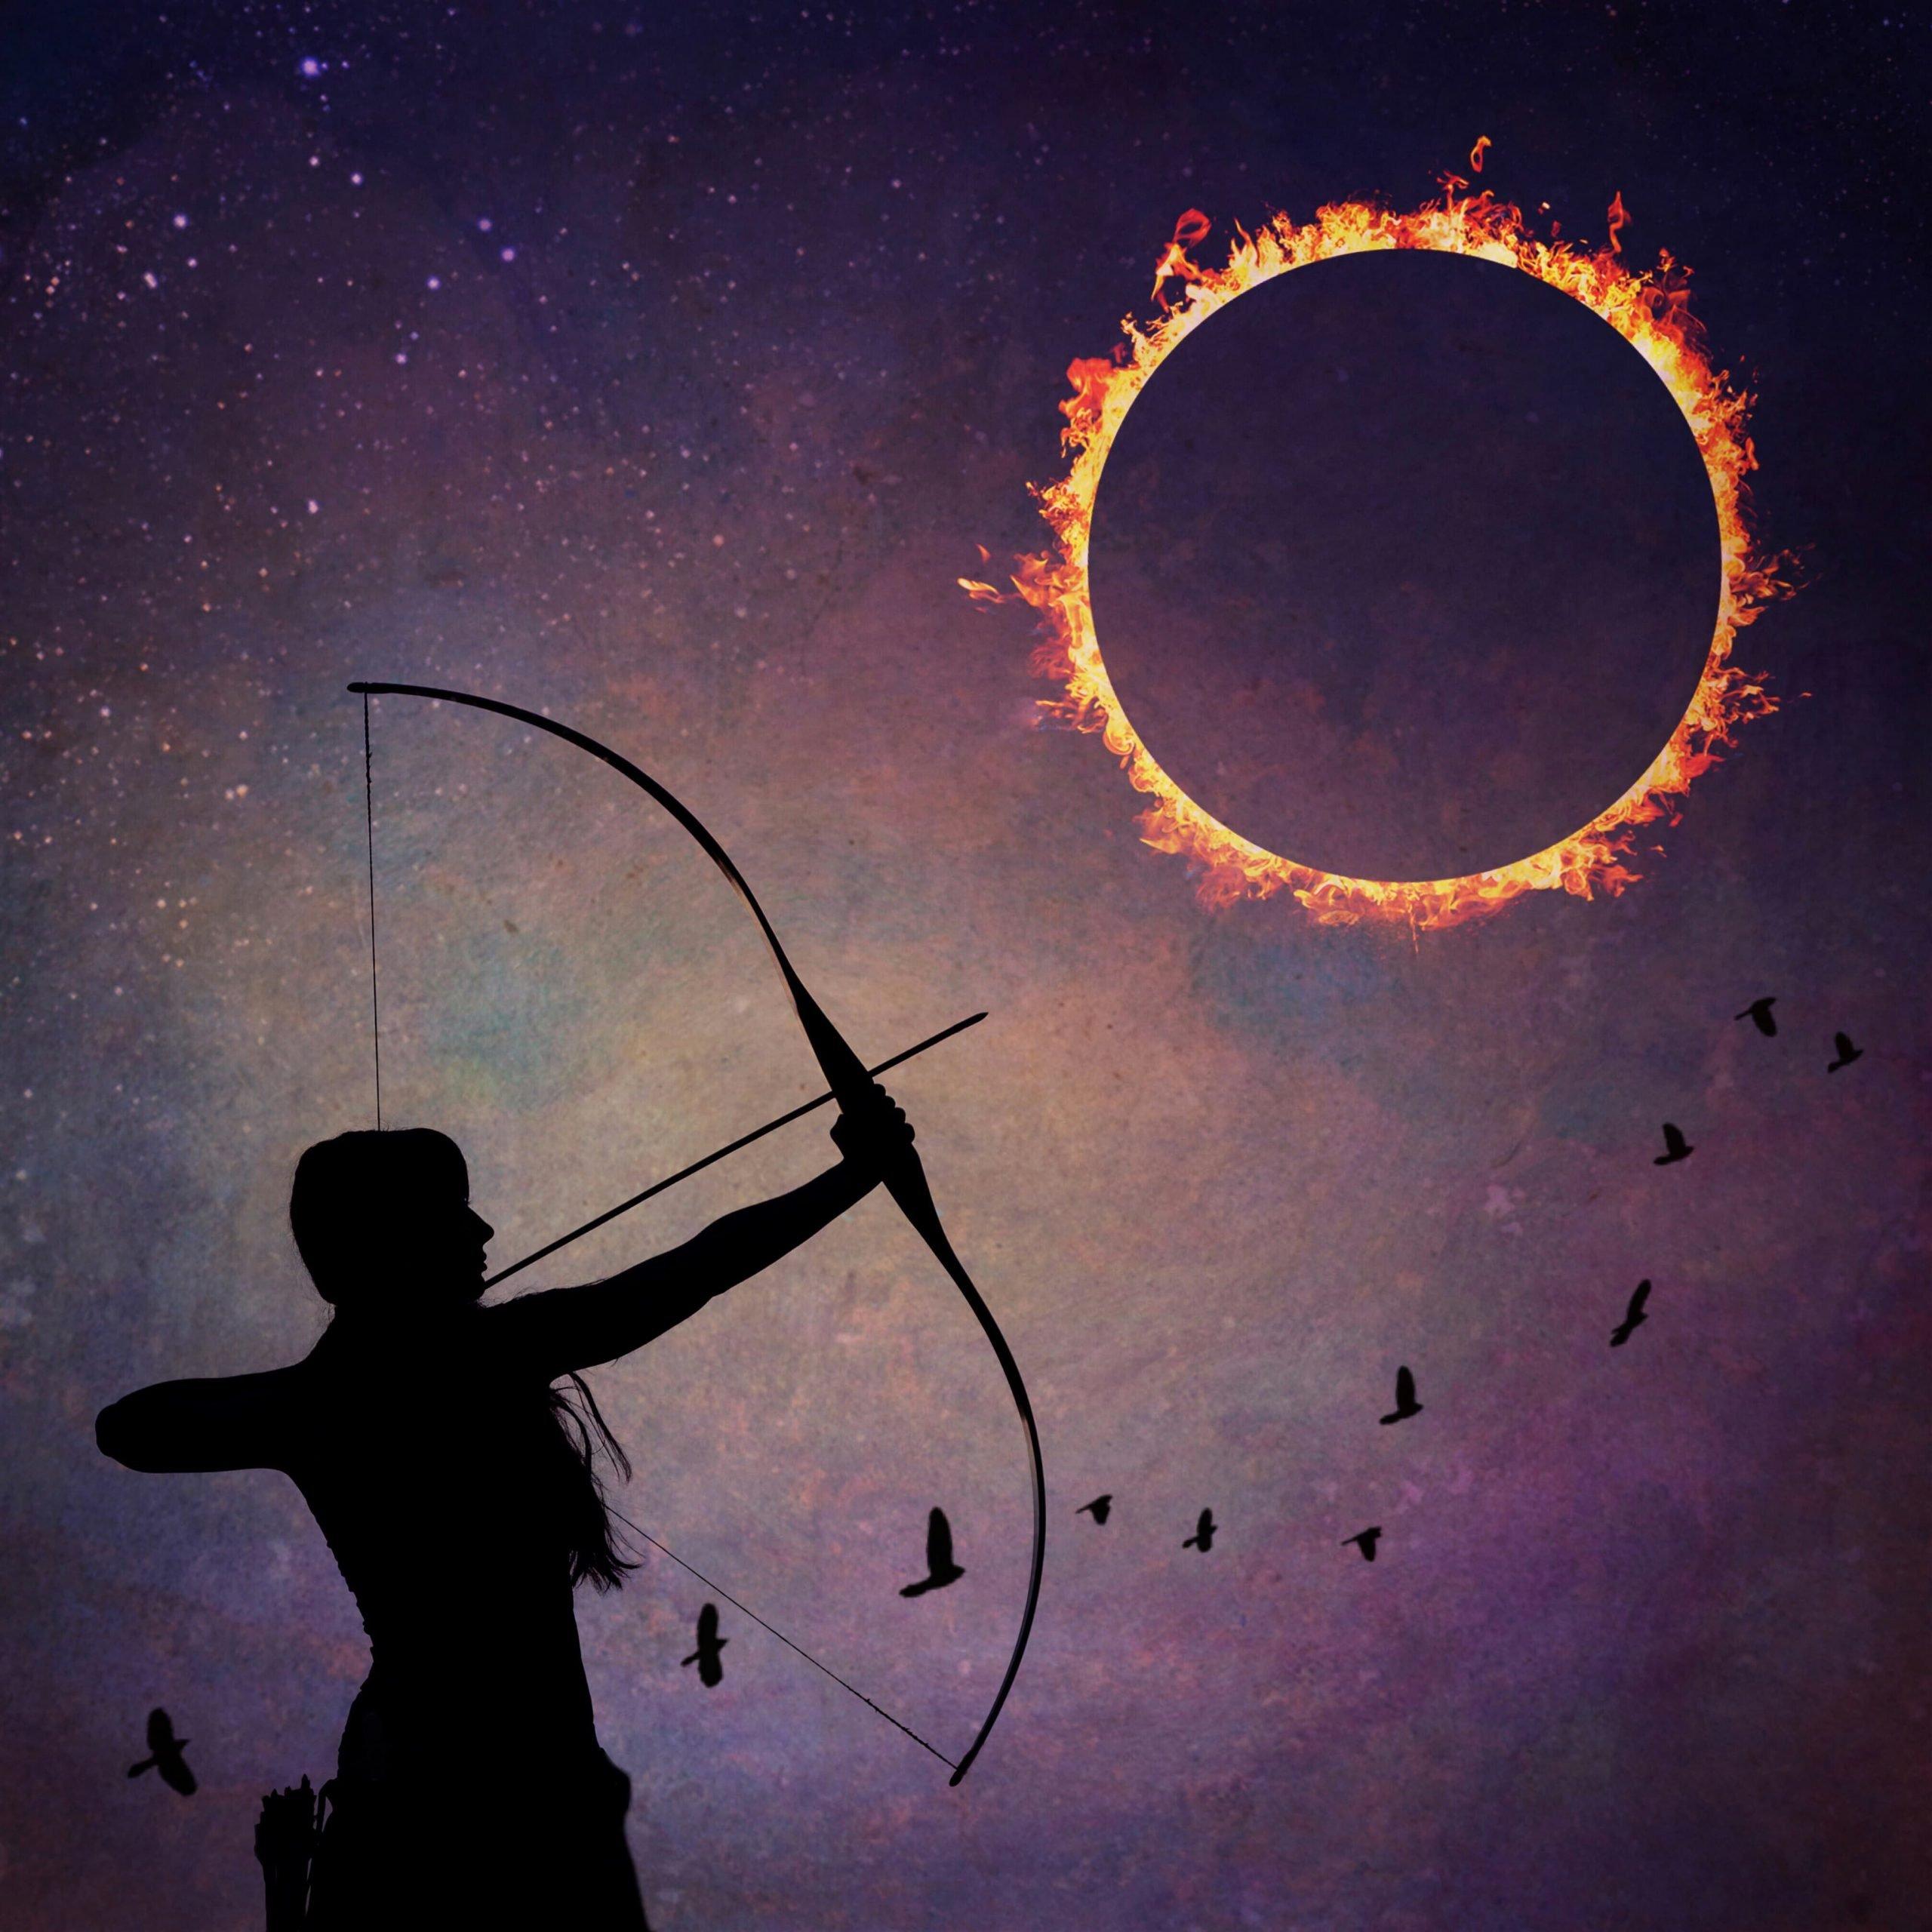 New Beginnings and Opportunity Ignite: December Total Solar Eclipse in Sagittarius December 14 2020